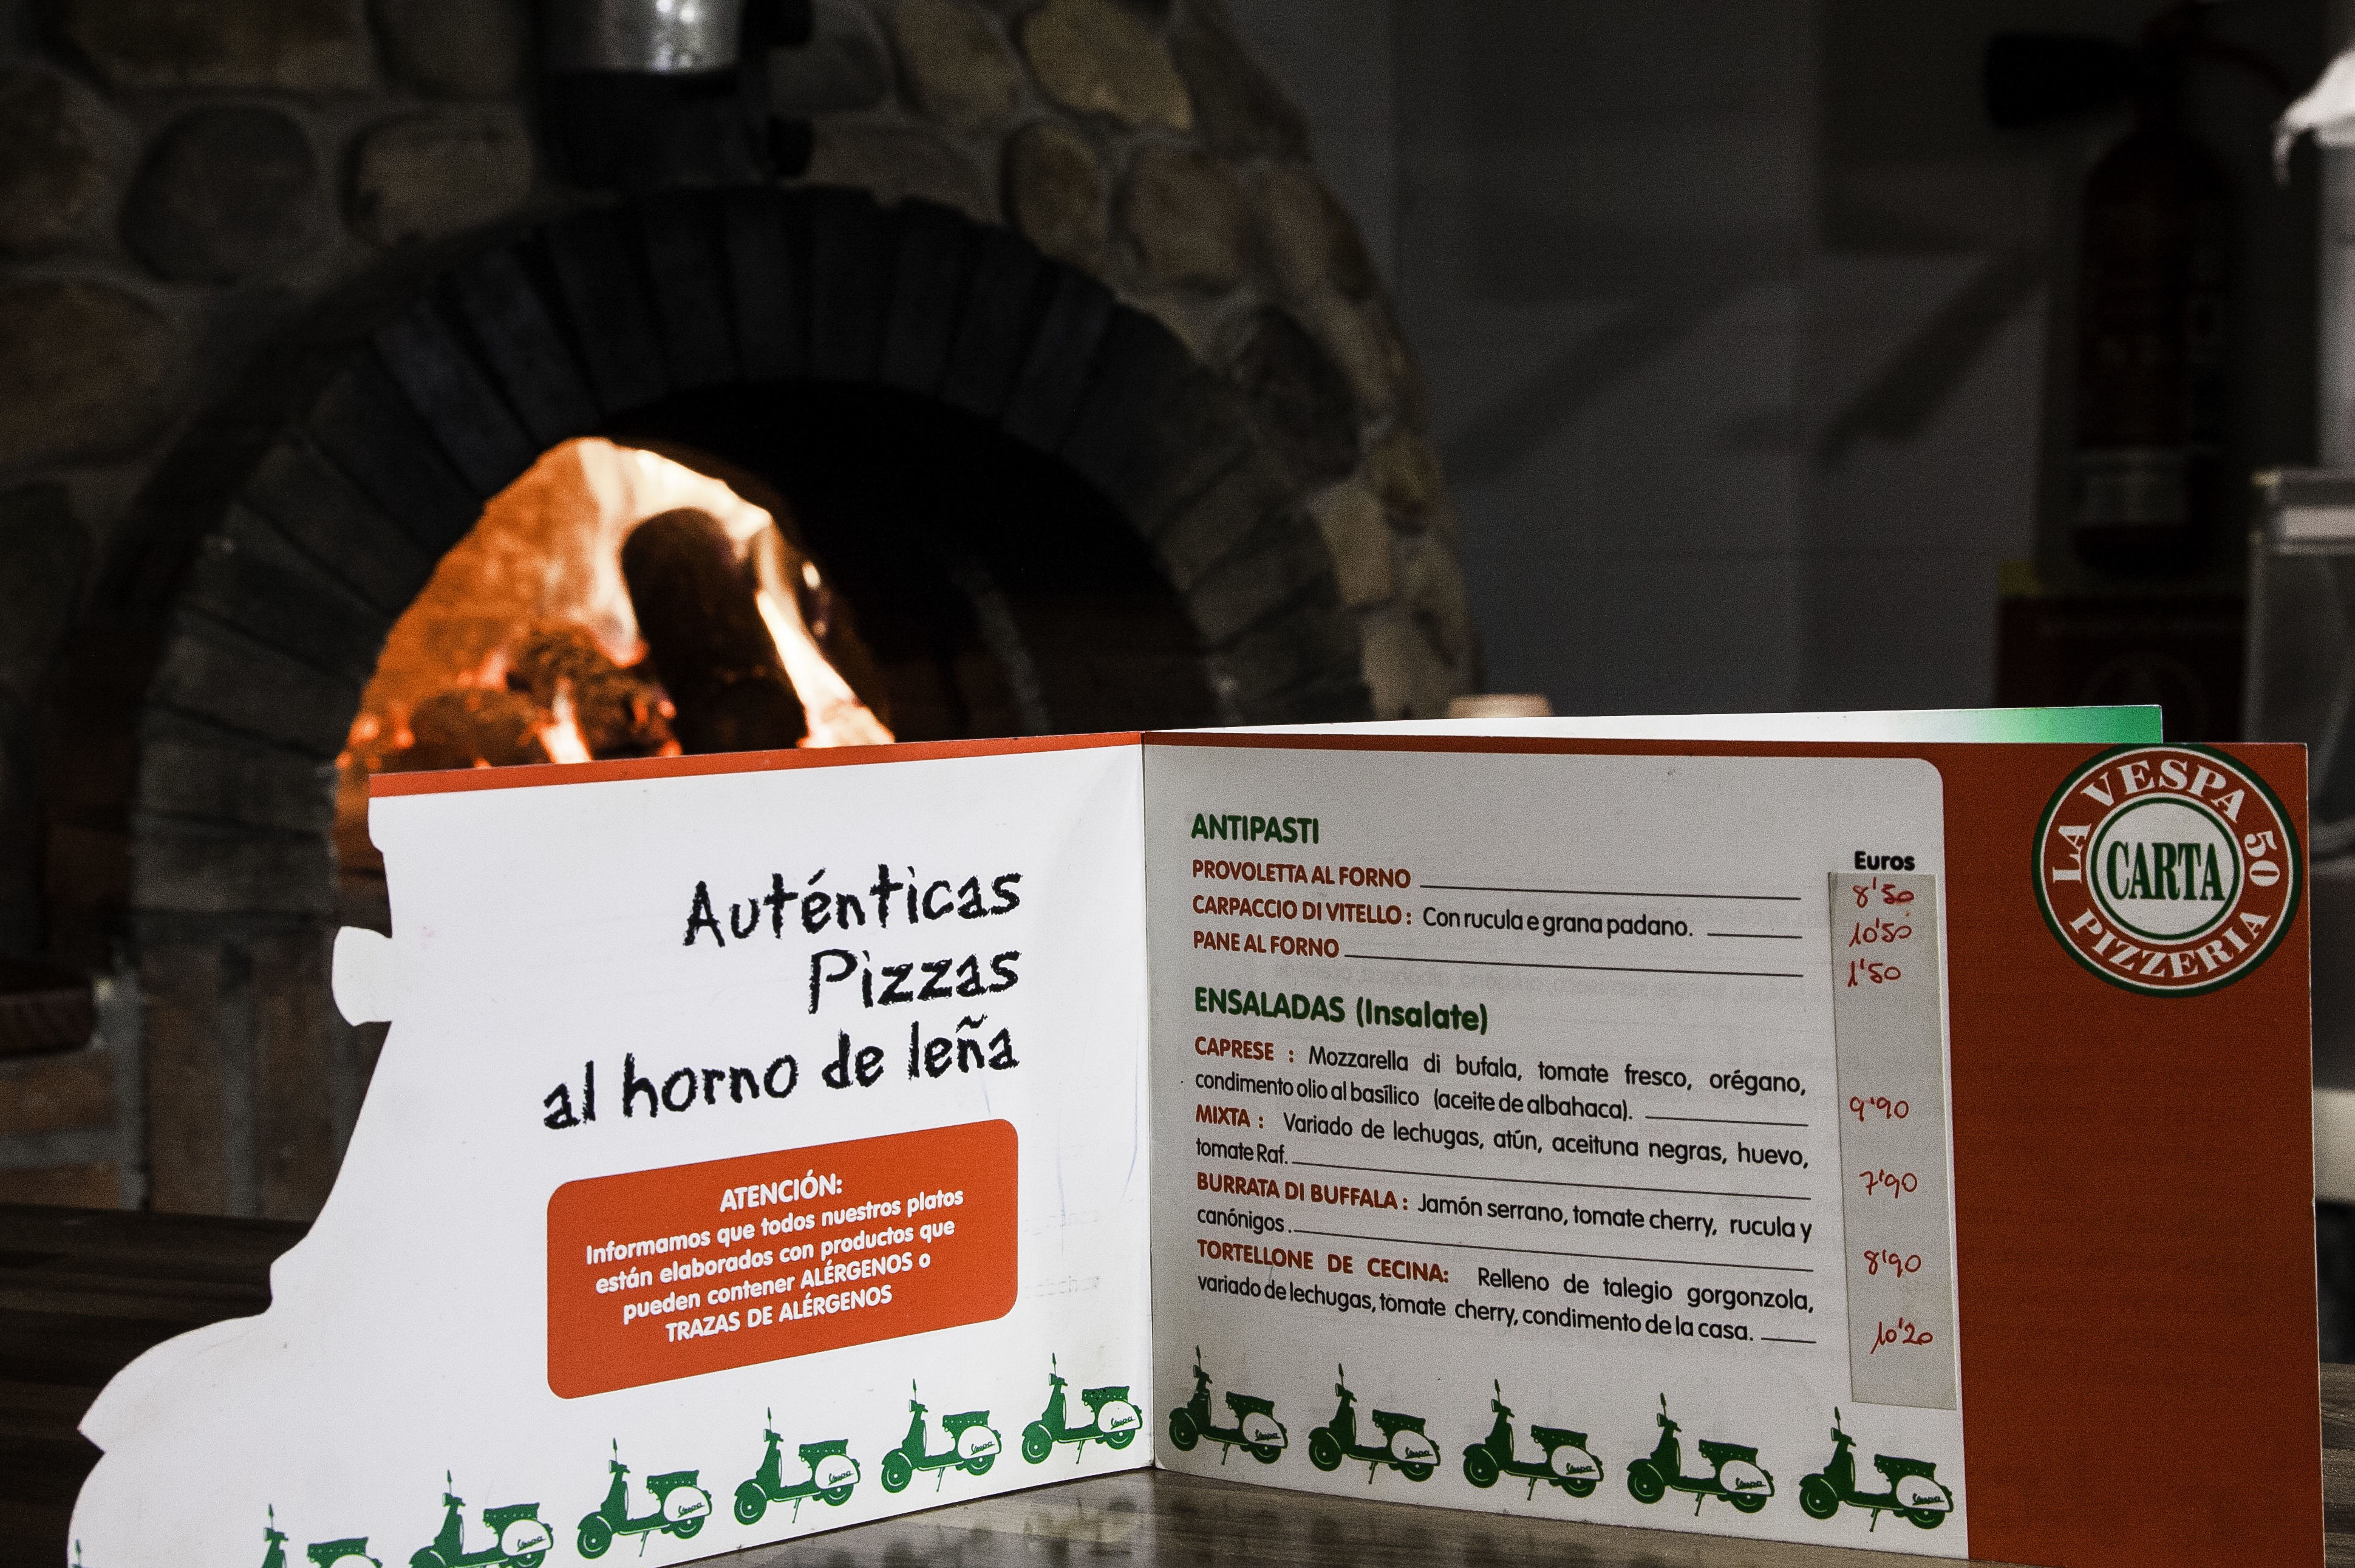 Autentica cocina Italianas, servicio a domicilio